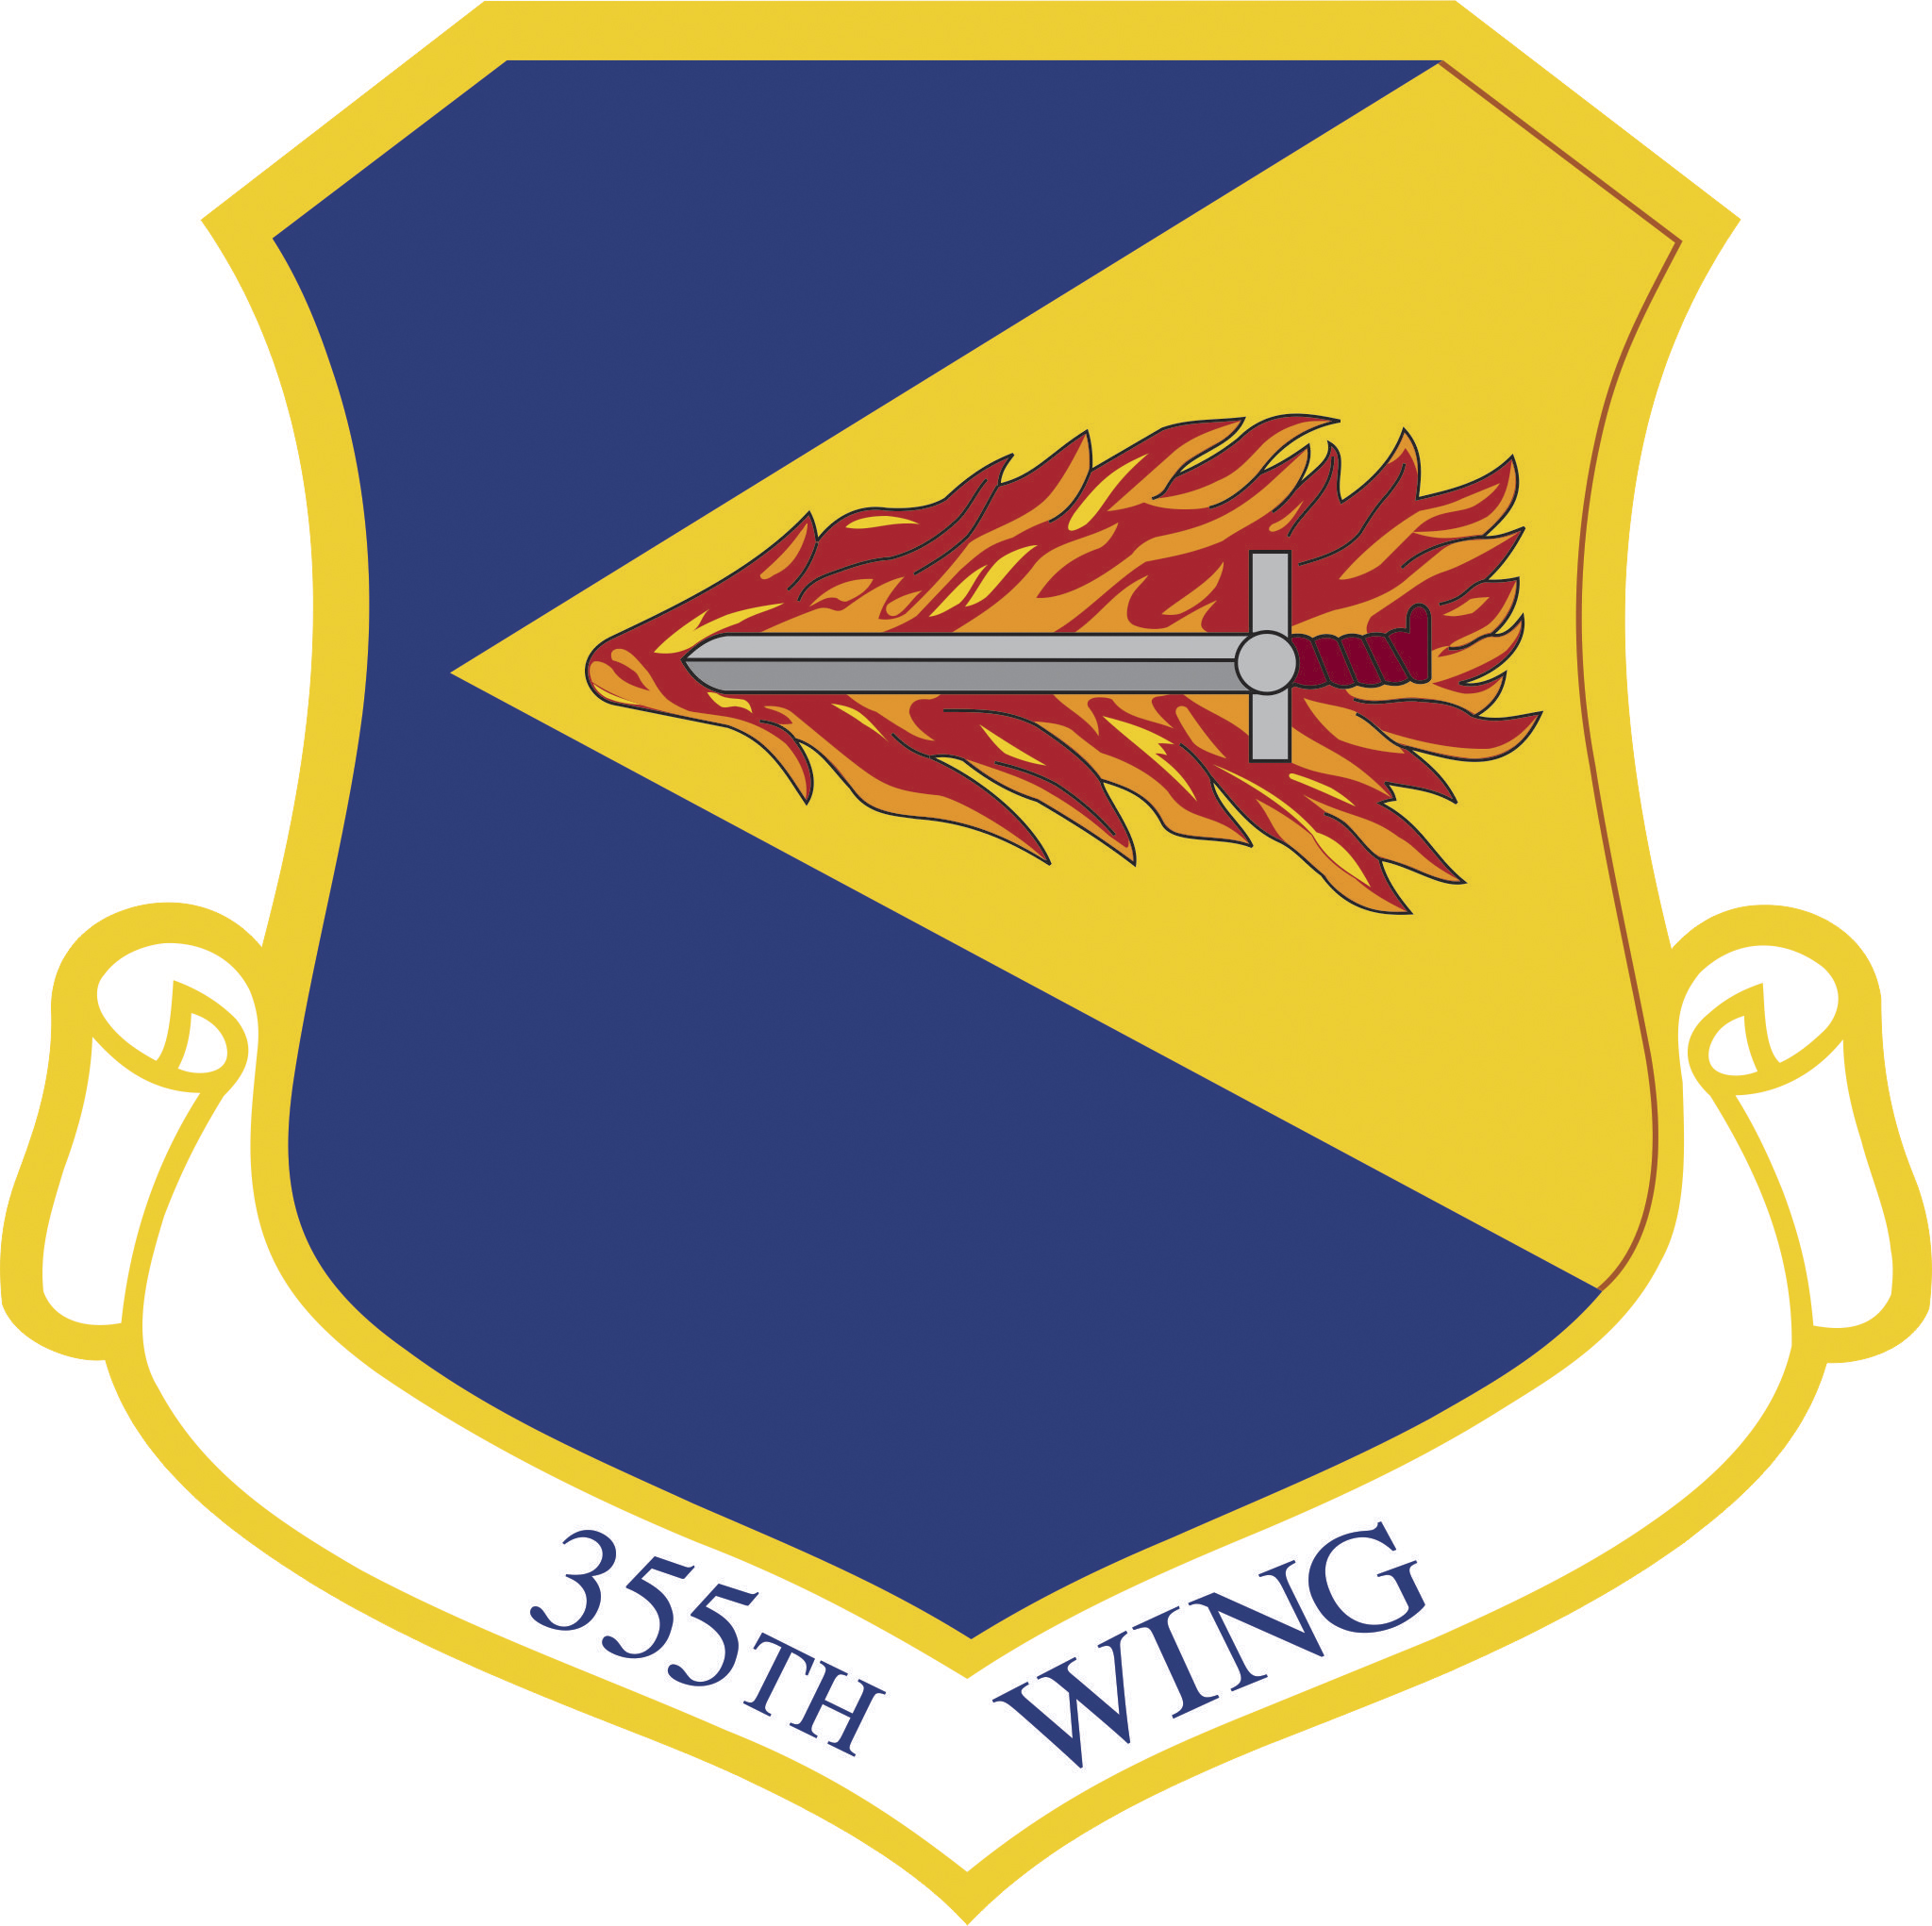 355th Wing shield